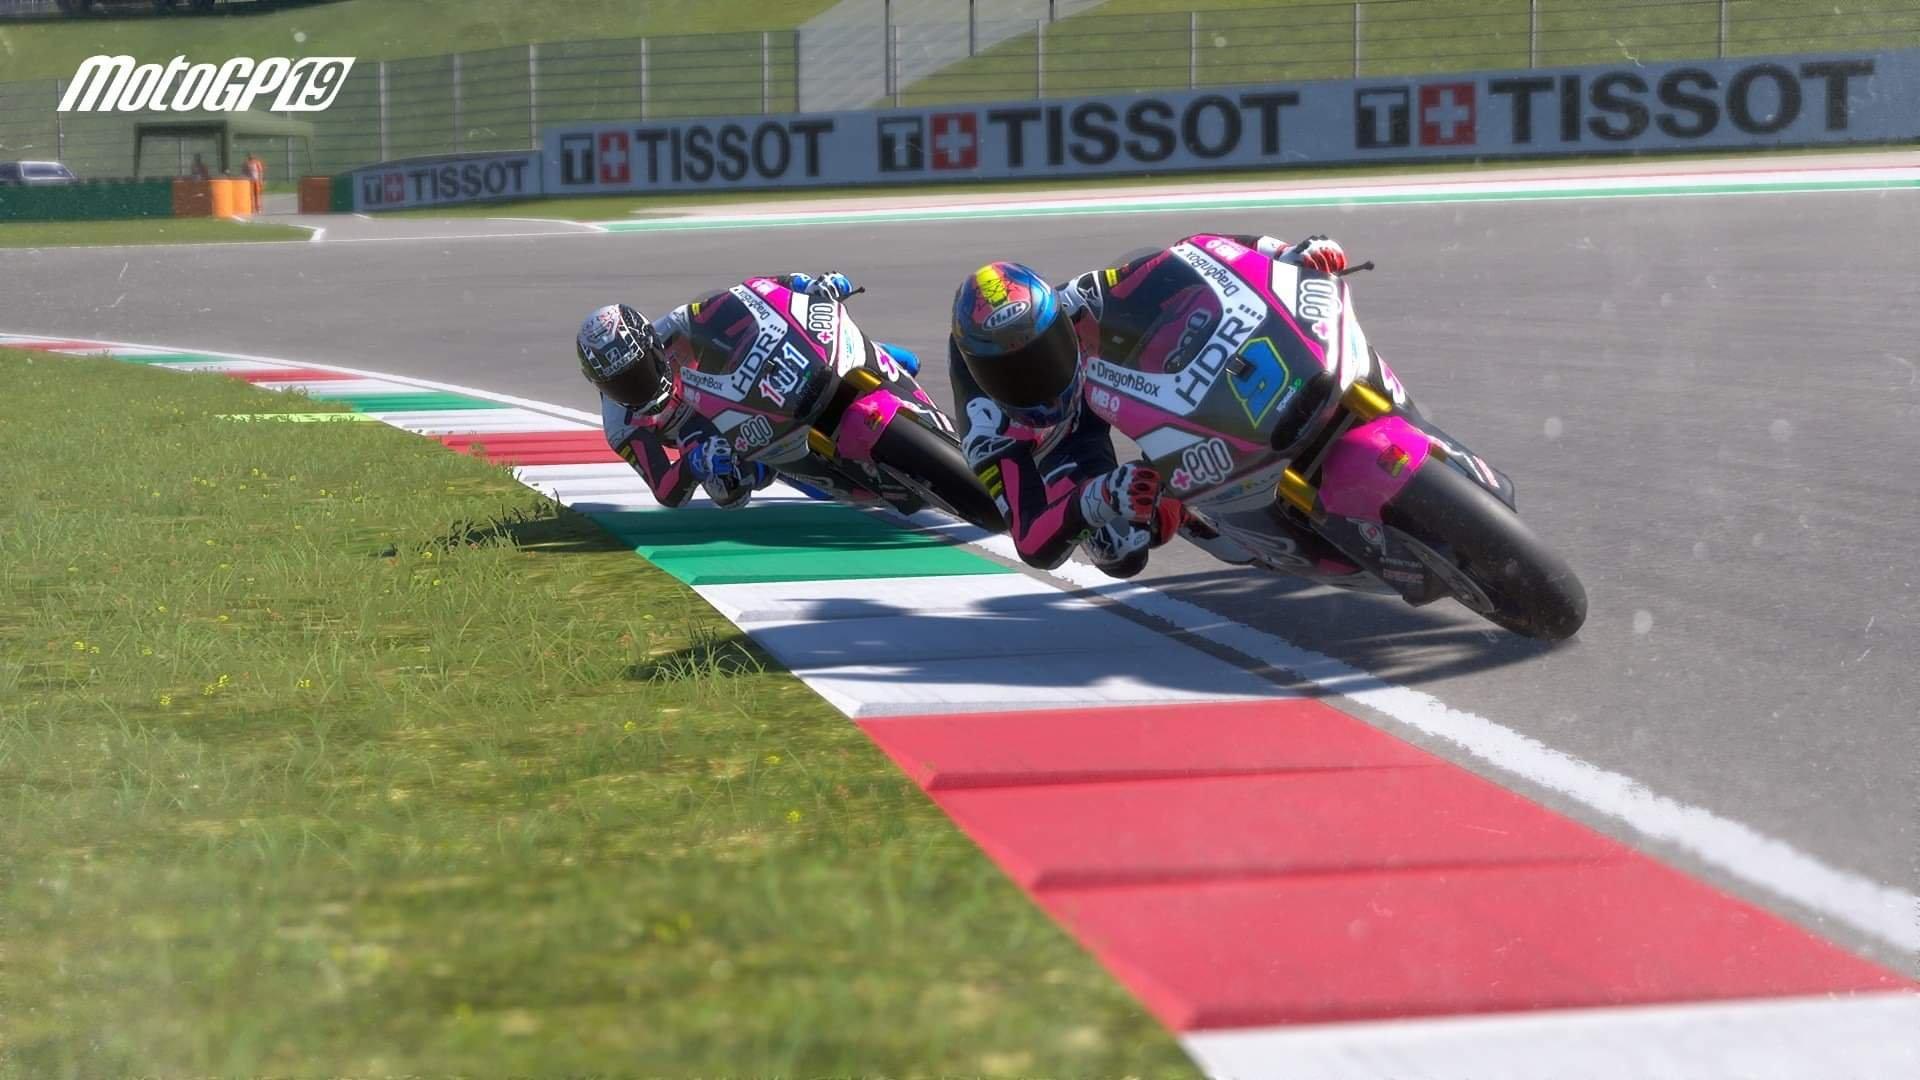 Moto GP 19 pc